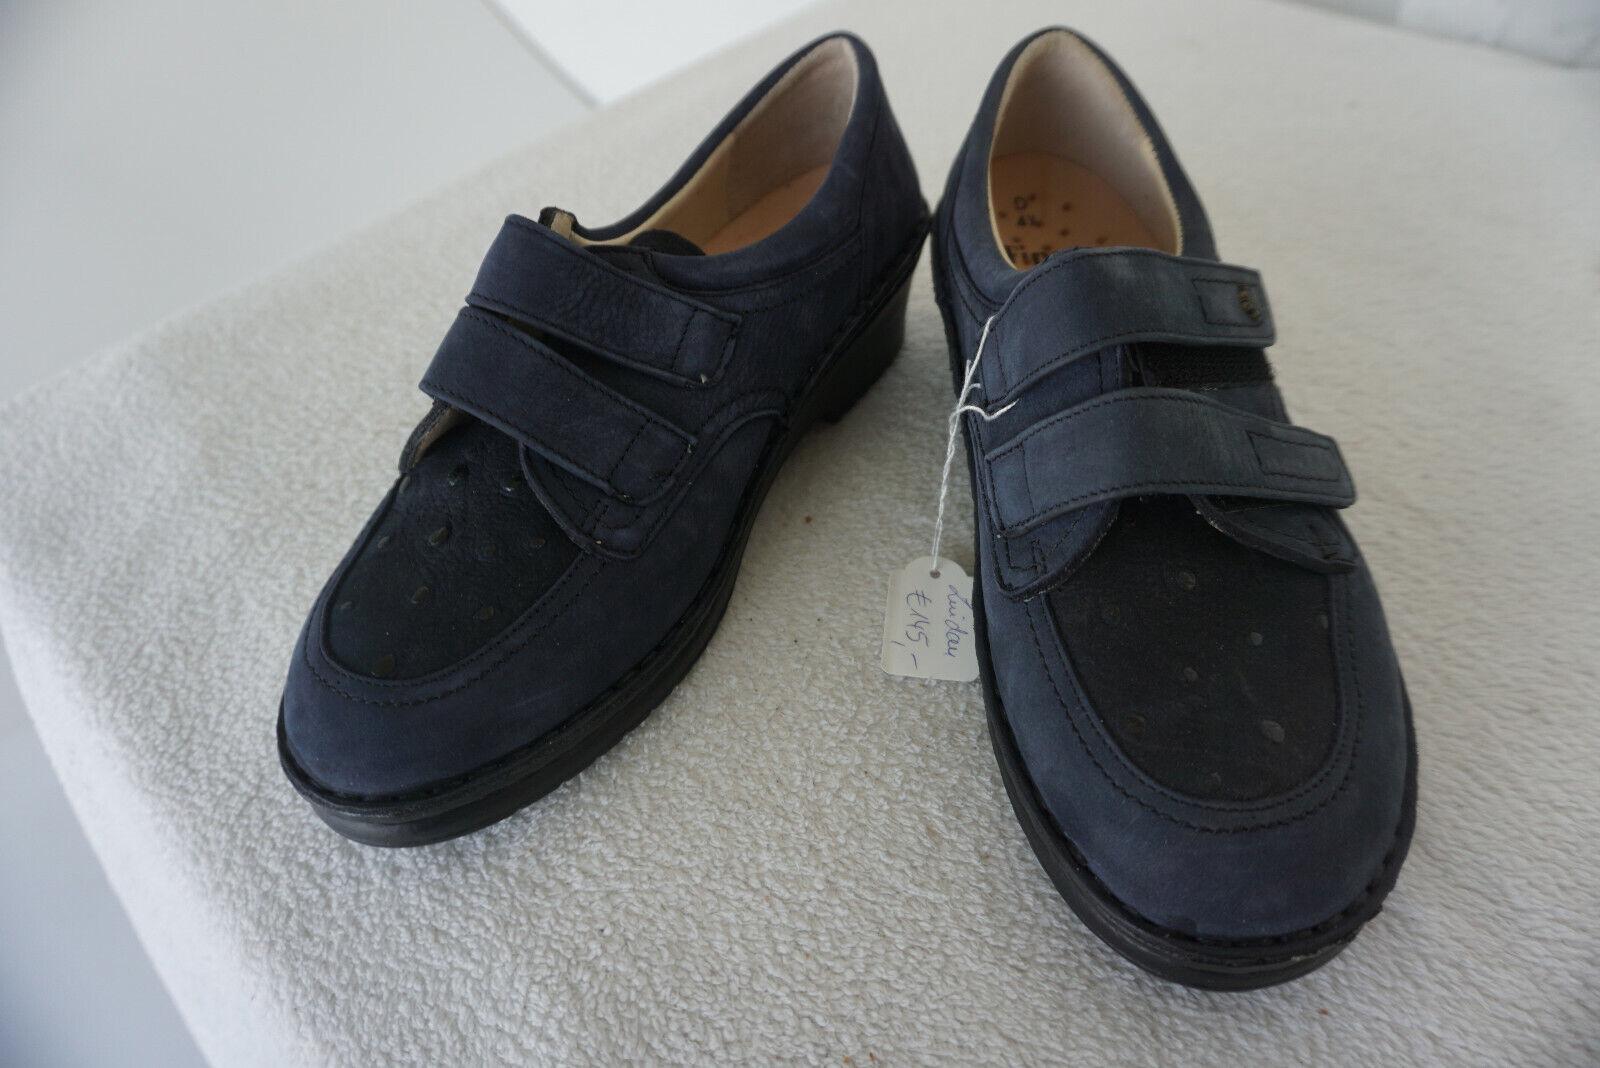 Finn Comfort Lindau shoes Velcro M Insoles Size 4,5 37,5 Navy Nubuck Leather New